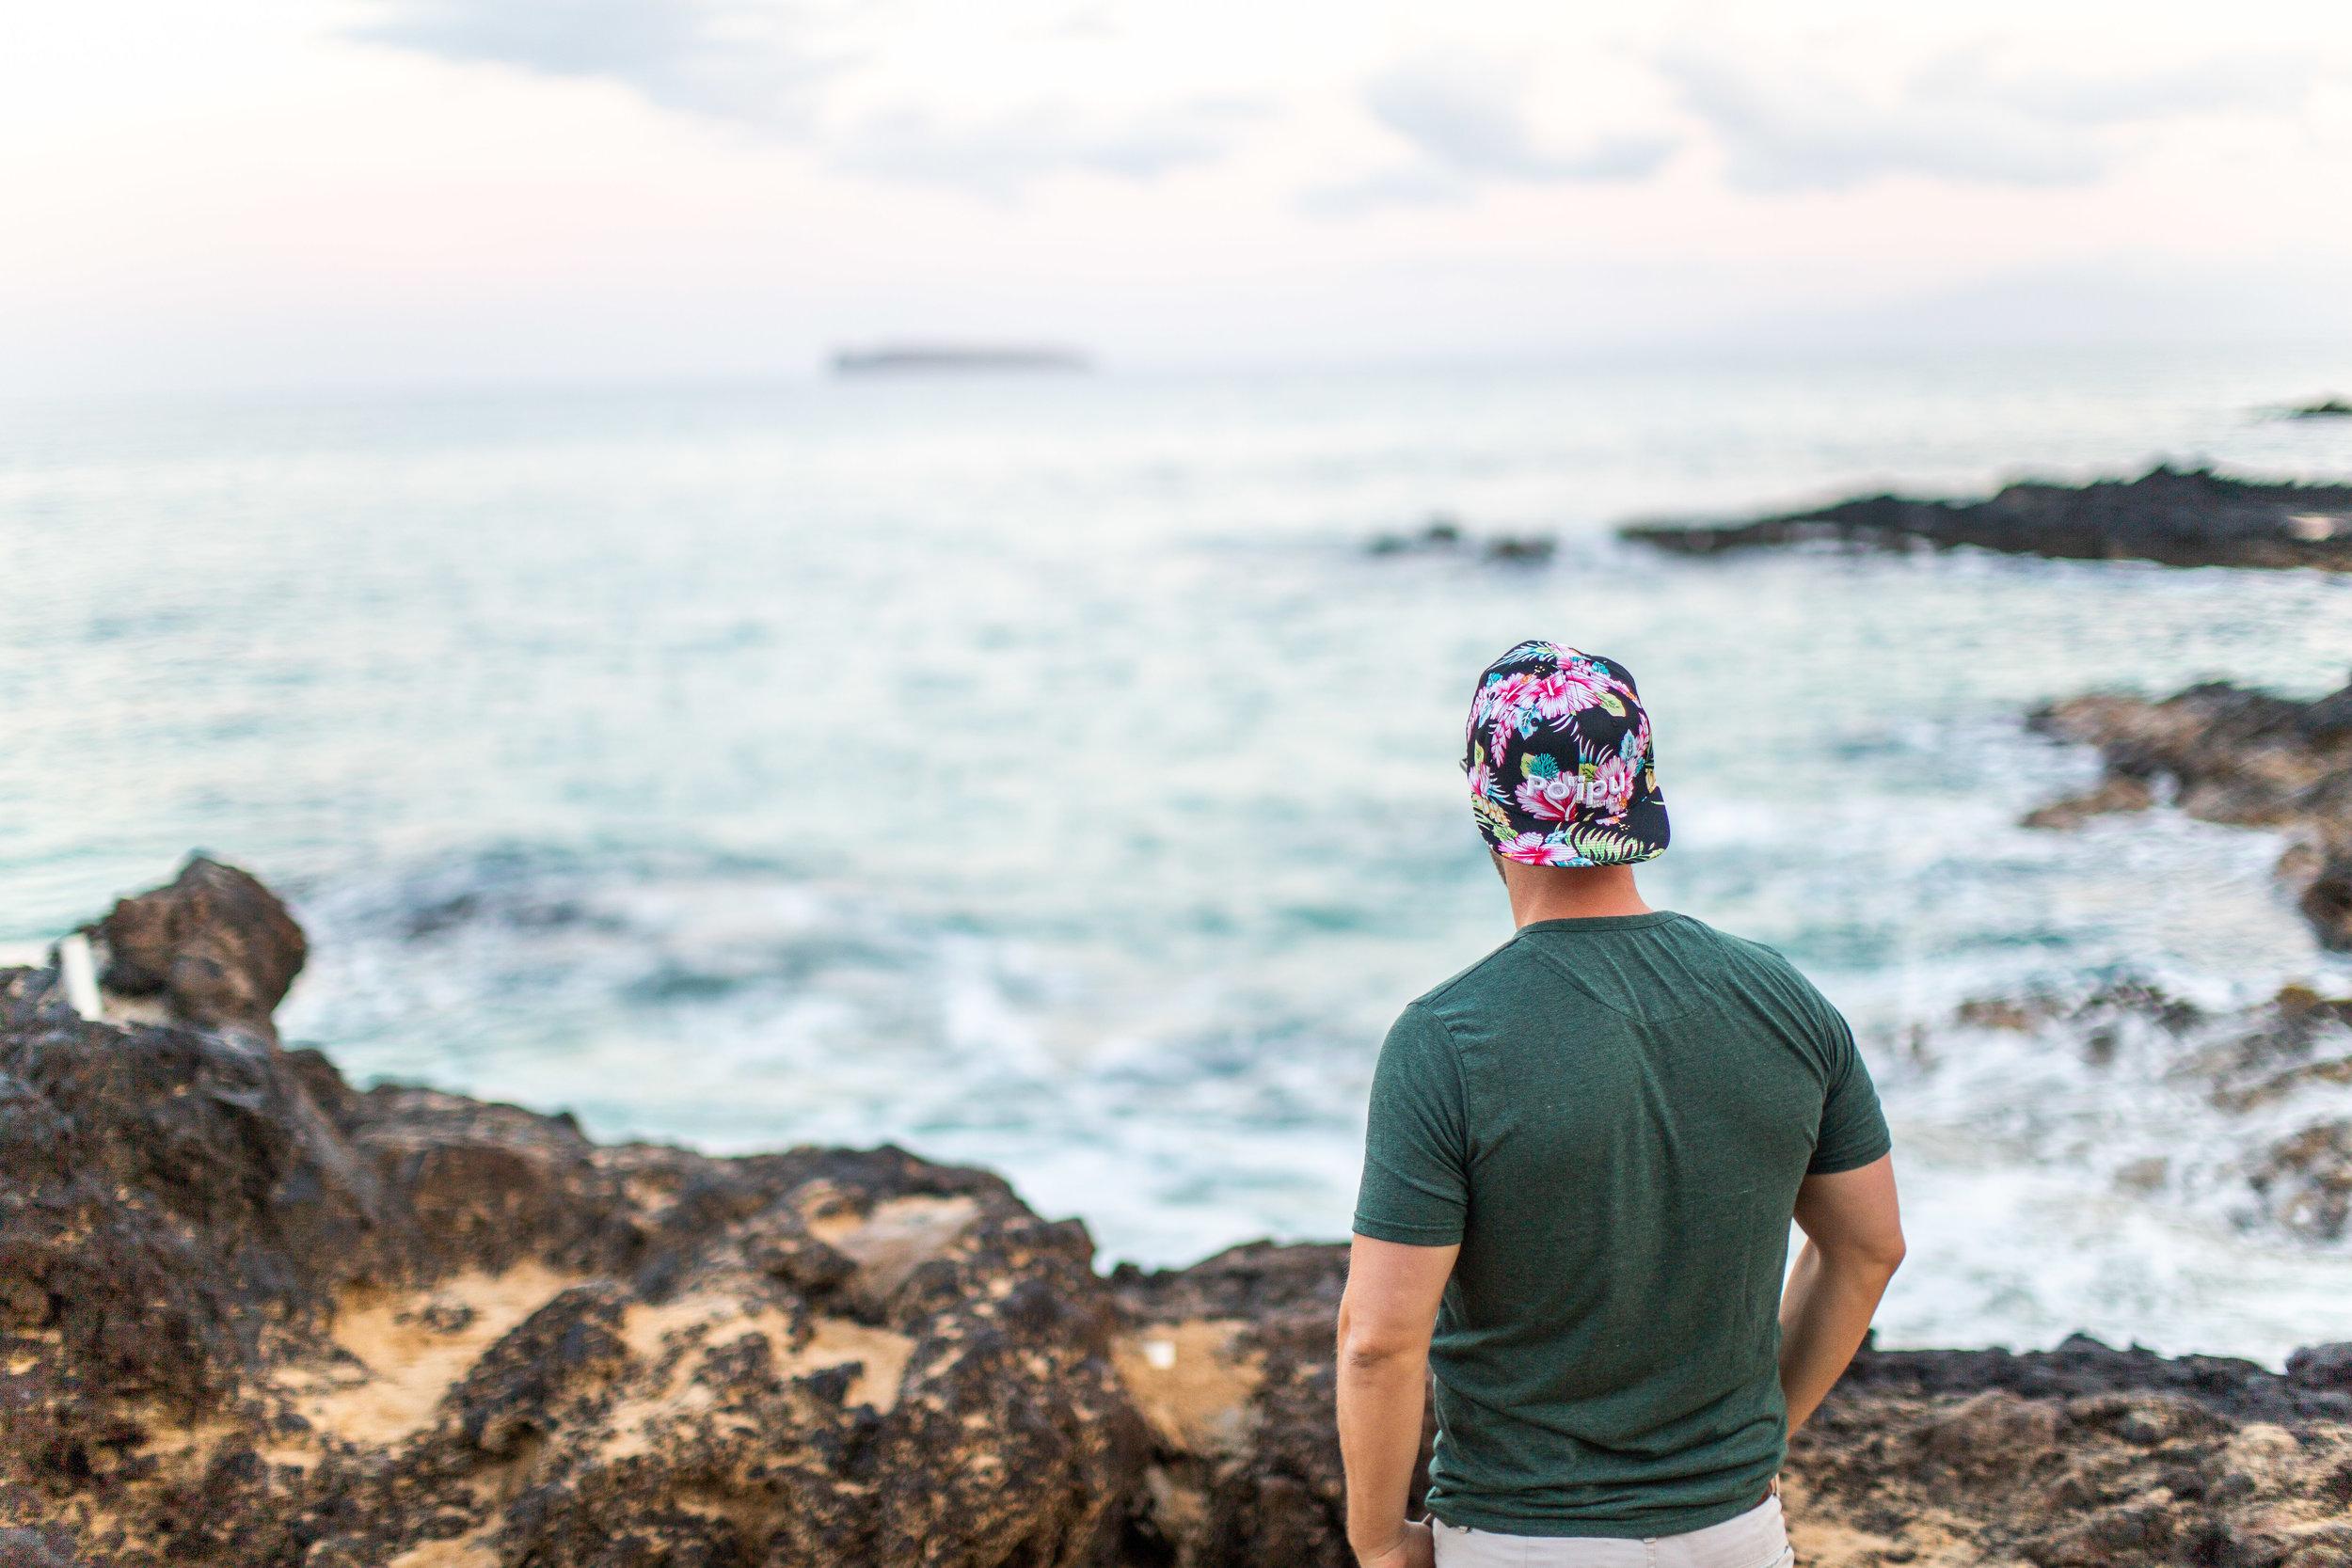 fizz-fade-hawaii-sunrise-stripes2-69.jpg